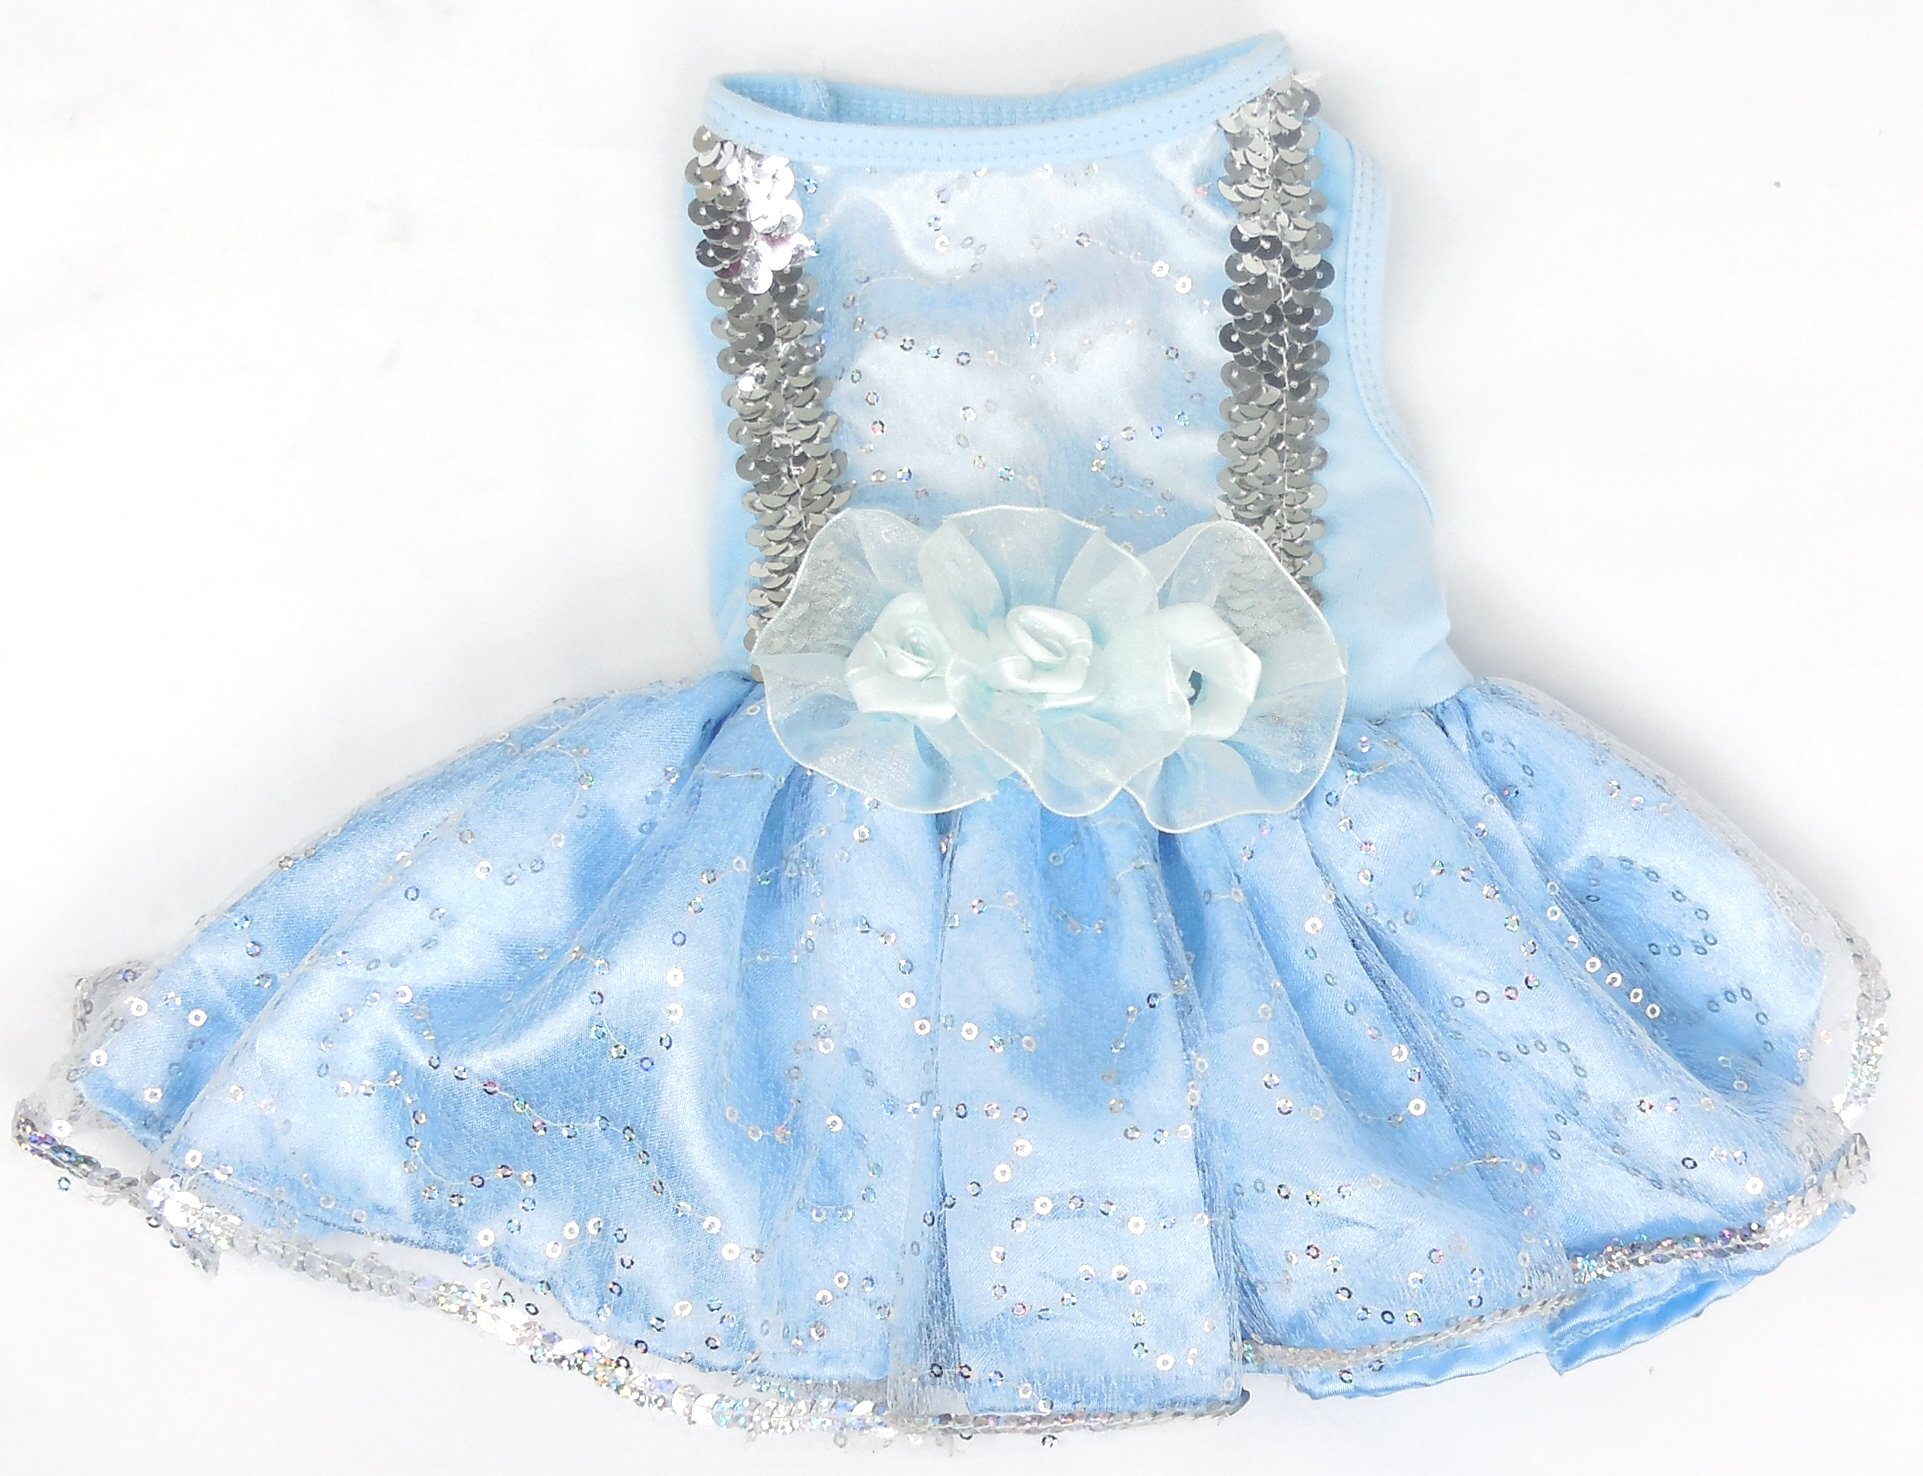 Pawpatu Cinderella Costume for Dogs, Small, Blue by Pawpatu